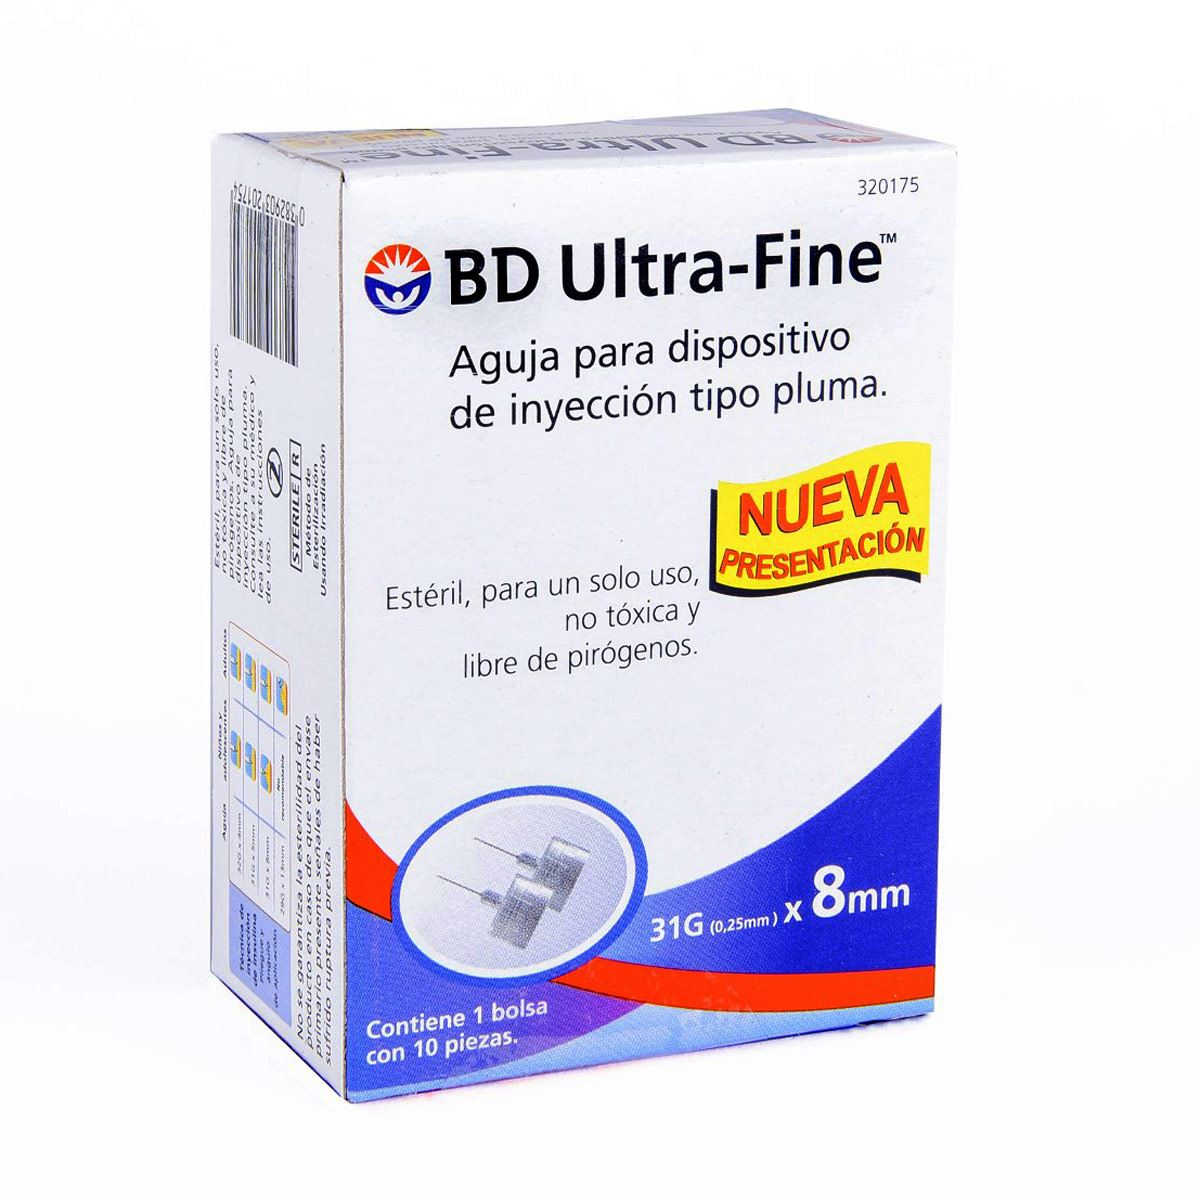 Aguja para Insulina BD Ultra-Fine 31G caja con 10 Pzs.